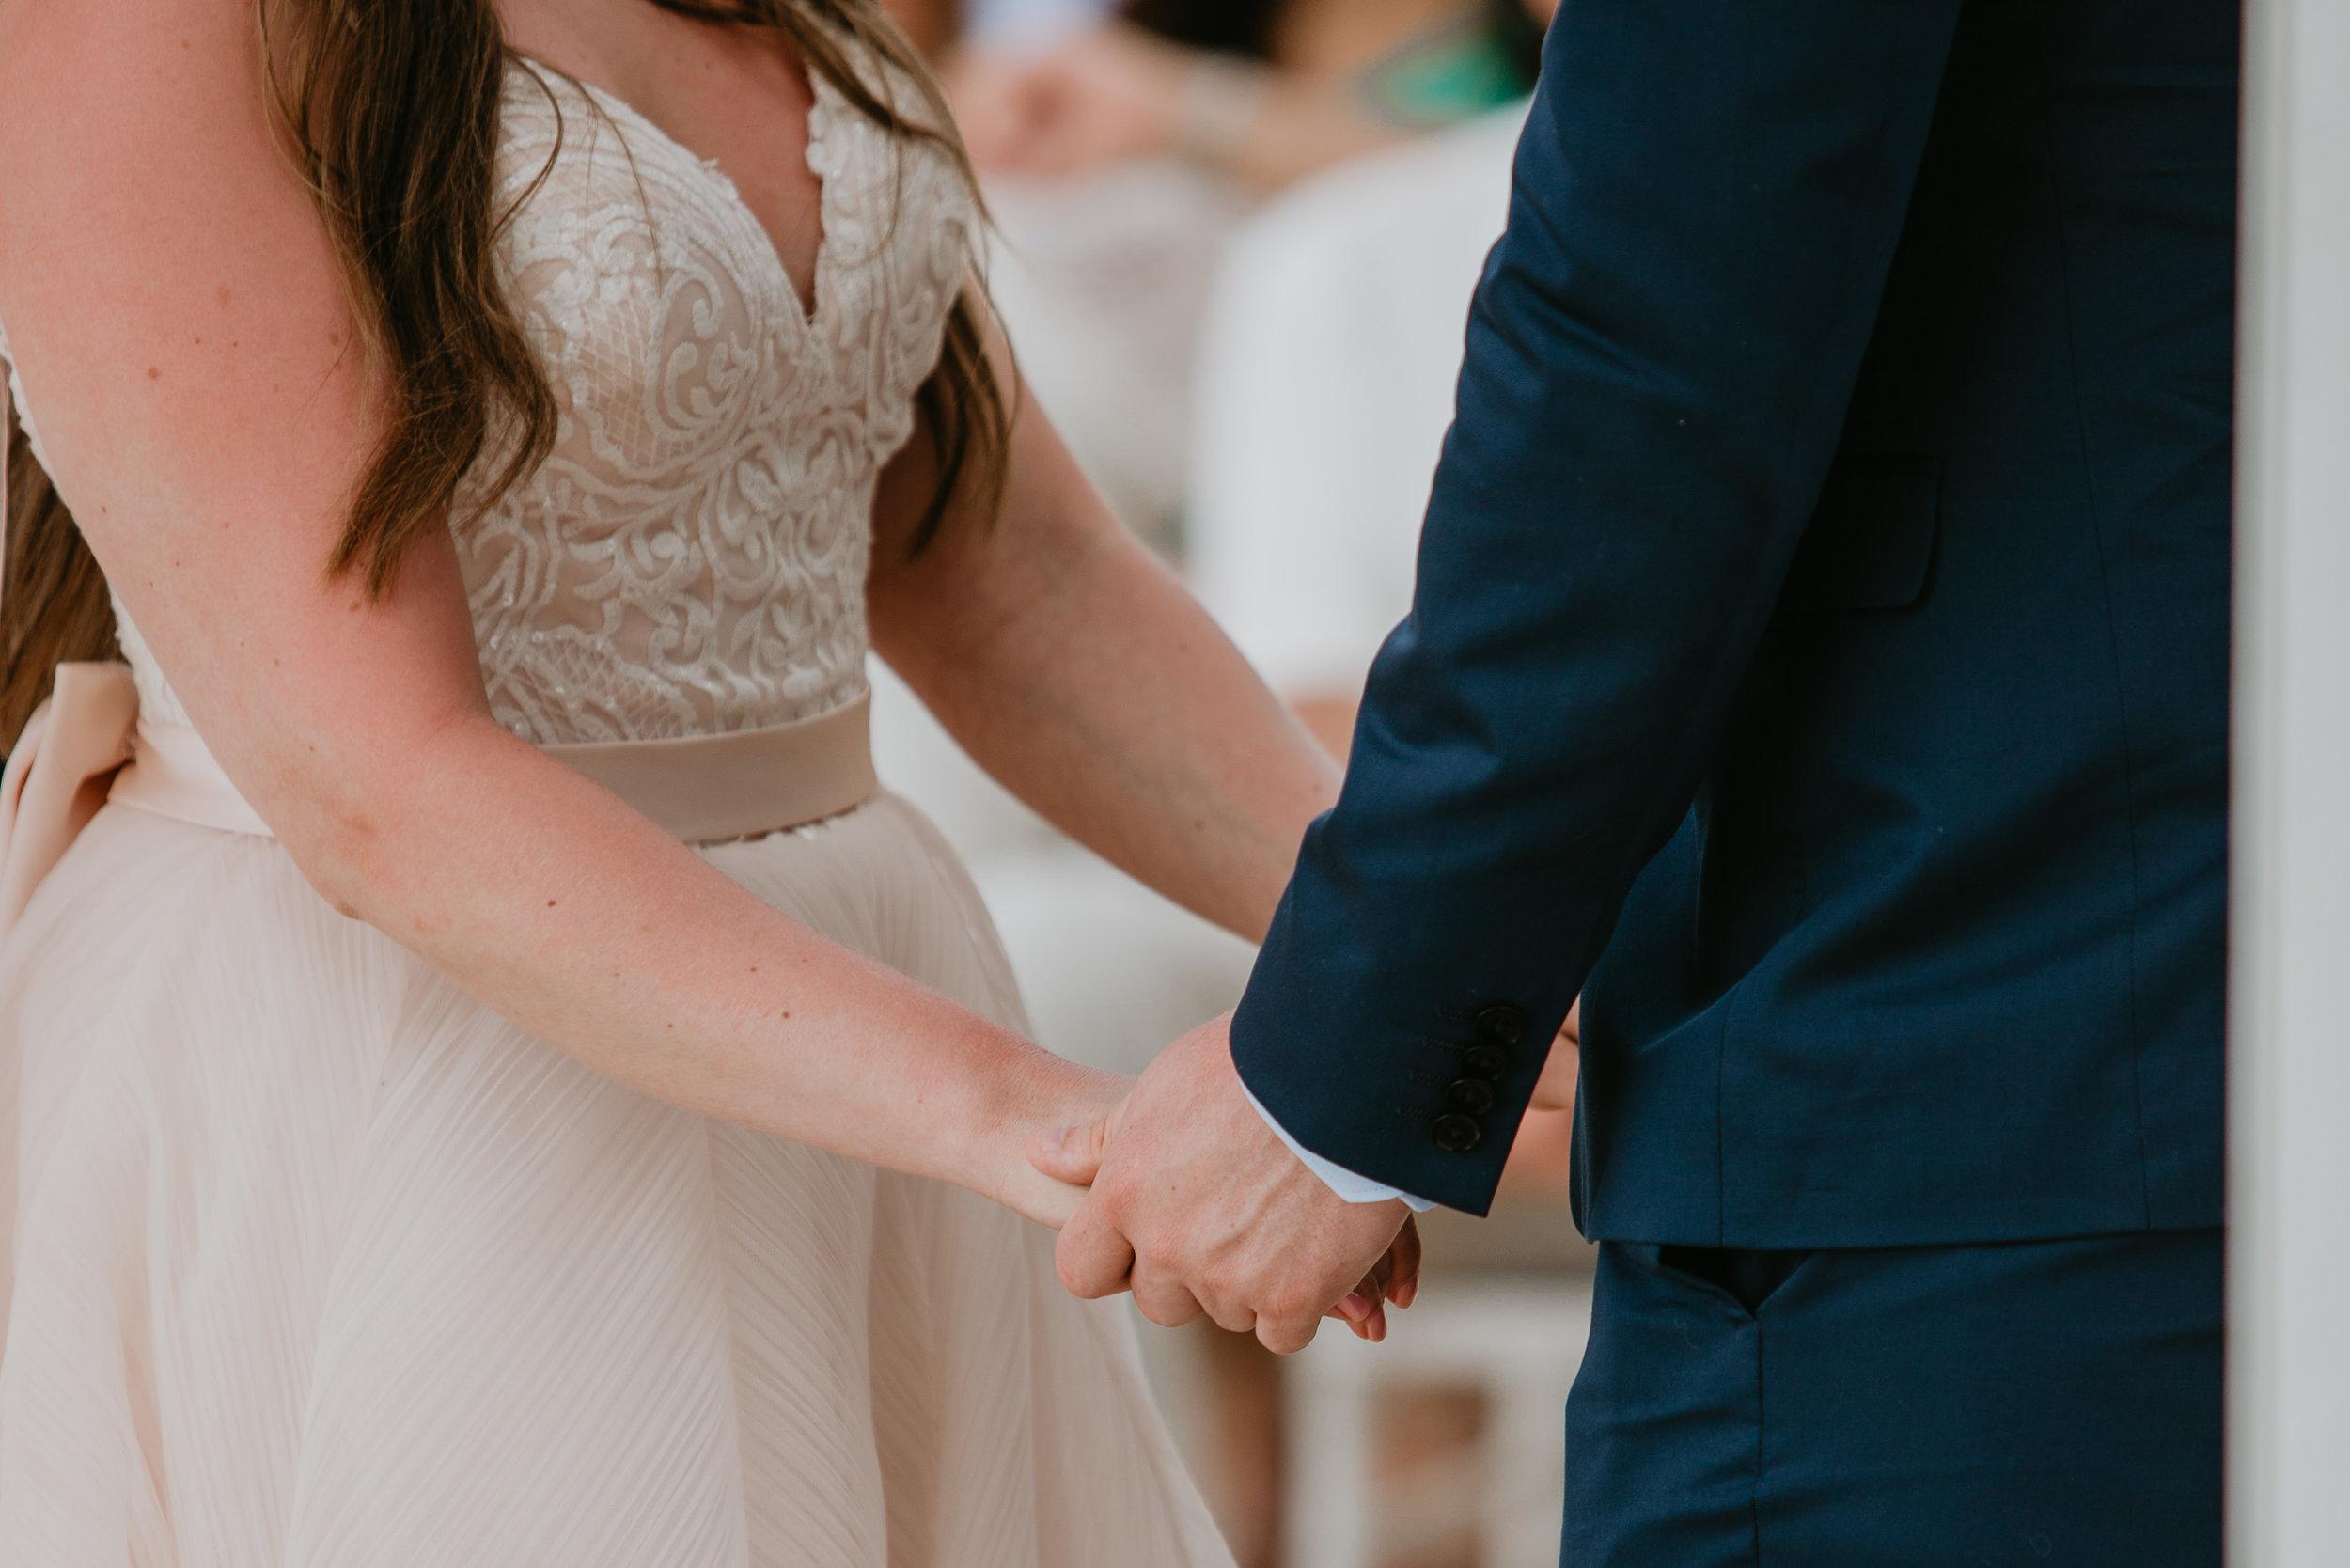 nicole-daacke-photography-destination-wedding-in-st-lucia-sandals-la-toc-intimate-island-wedding-carribean-elopement-photographer-chill-island-wedding-64.jpg